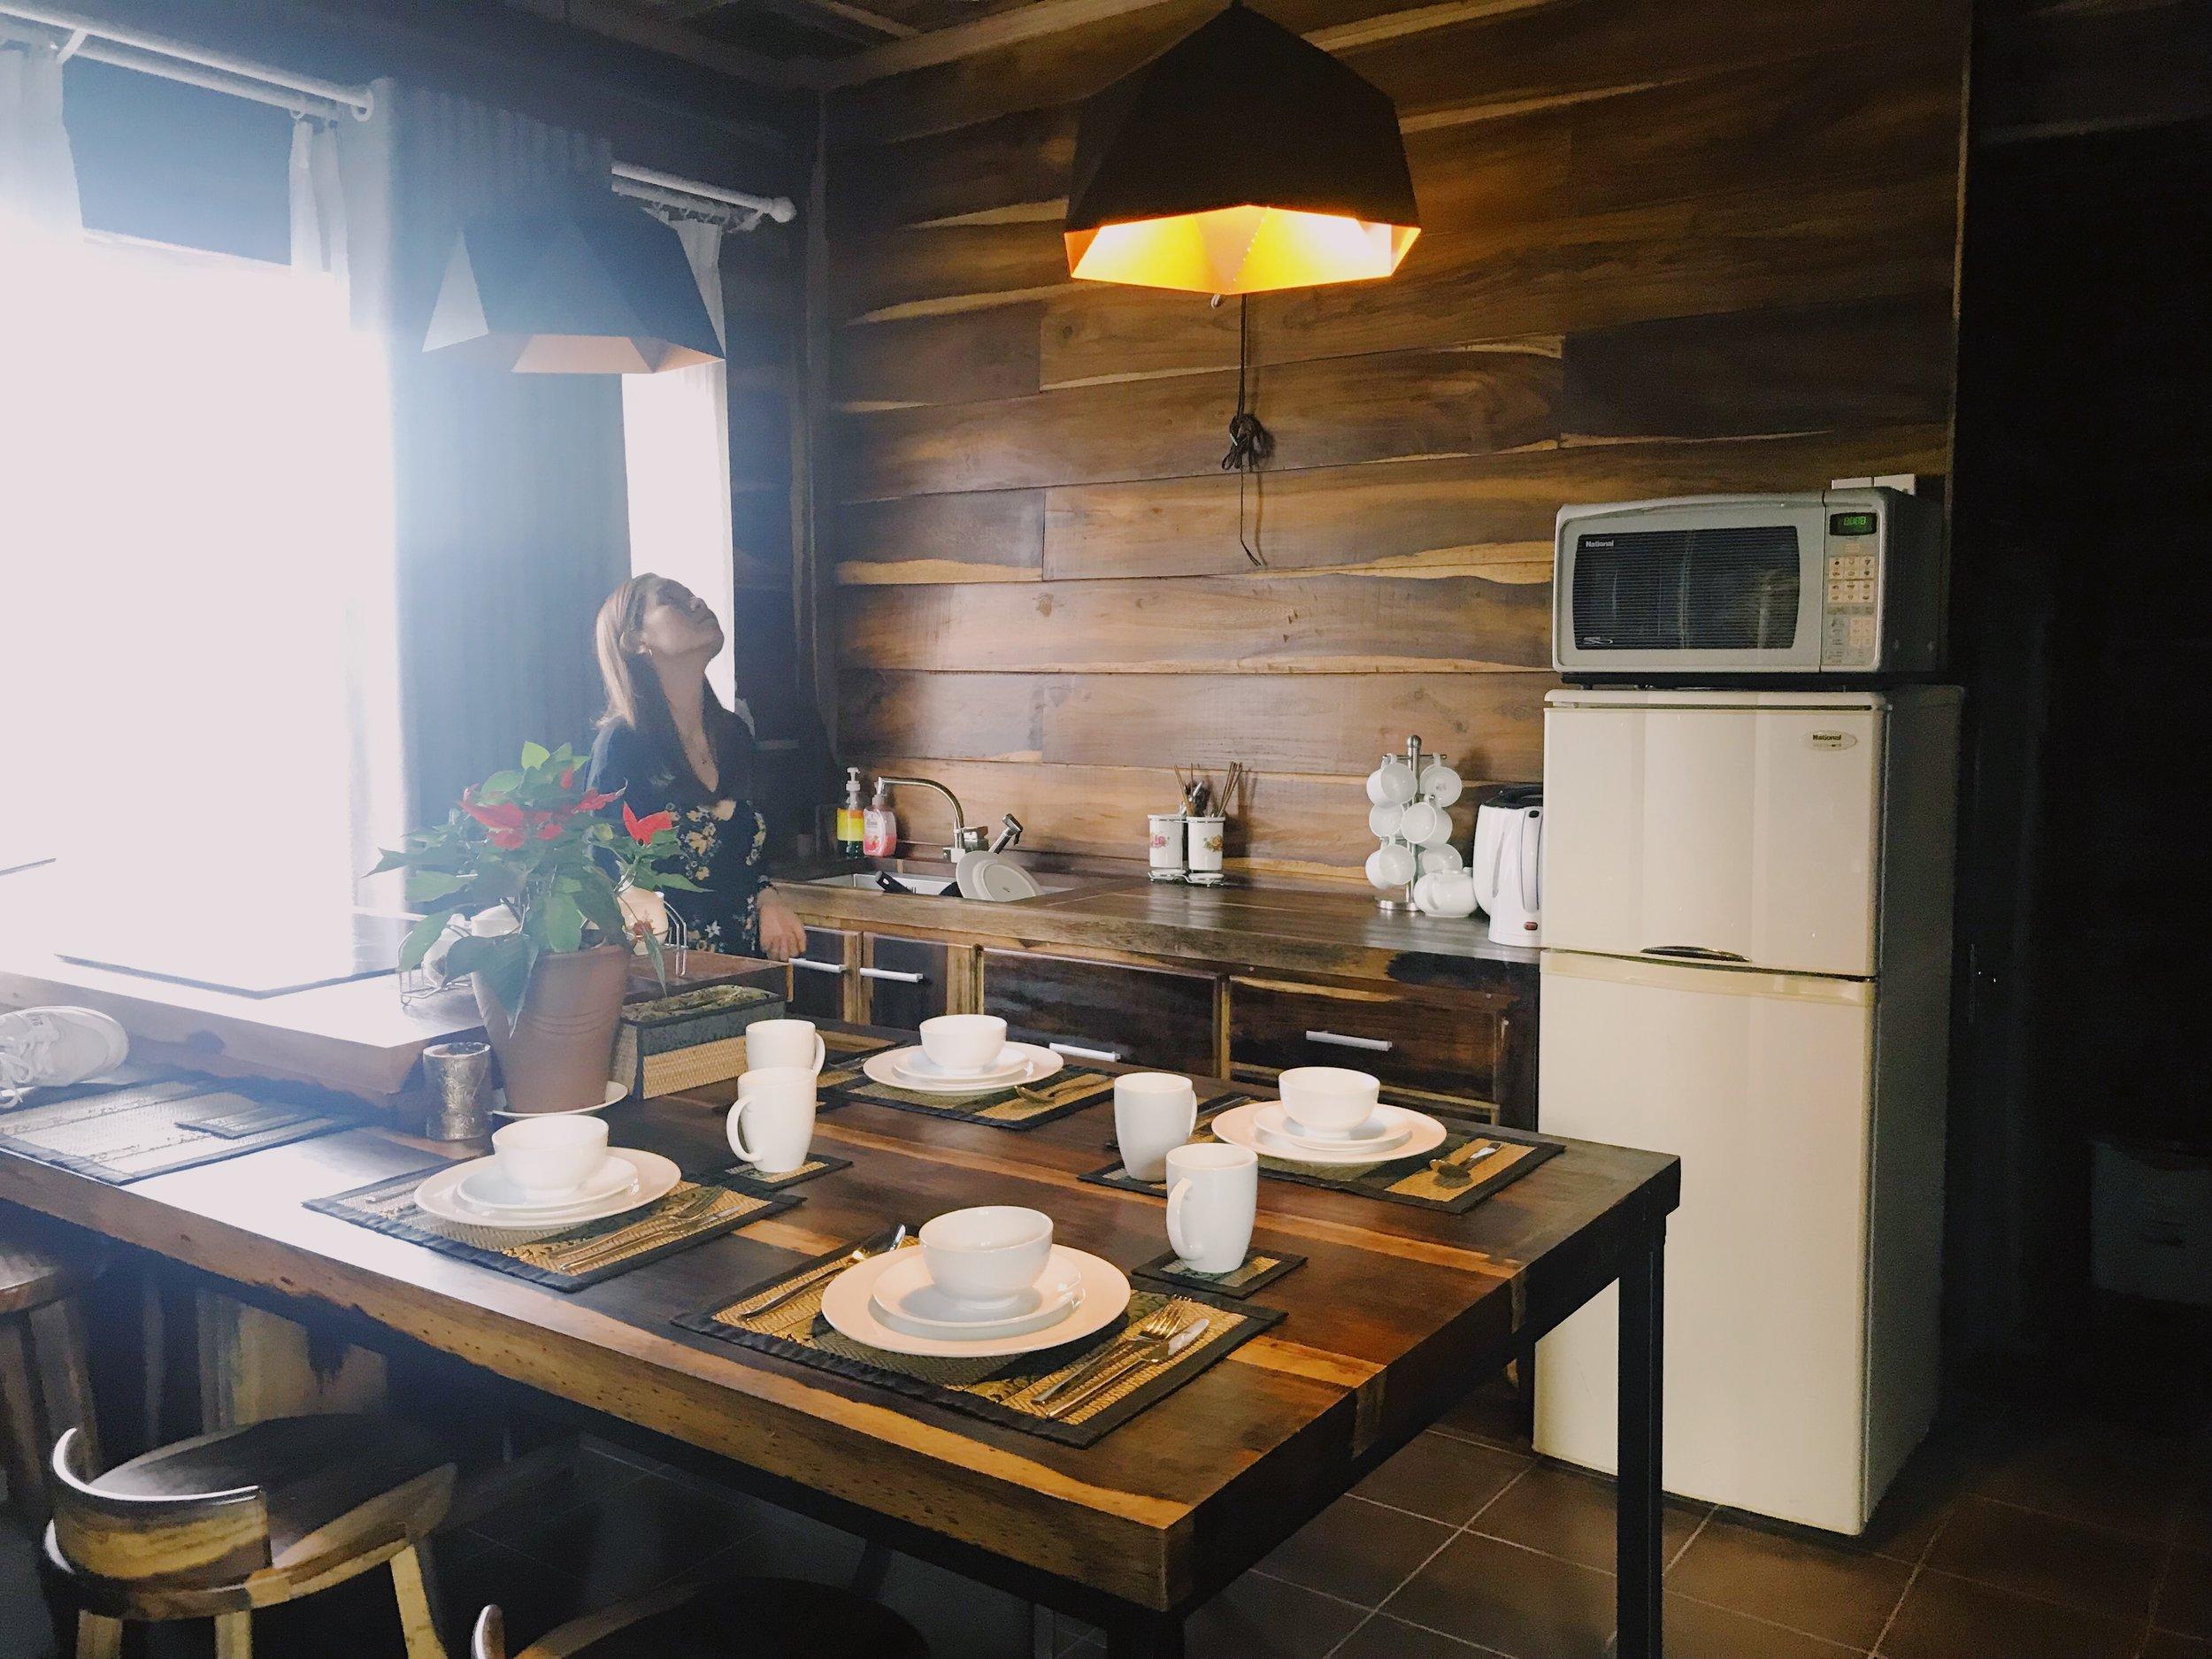 dalat-airbnb-1.JPG